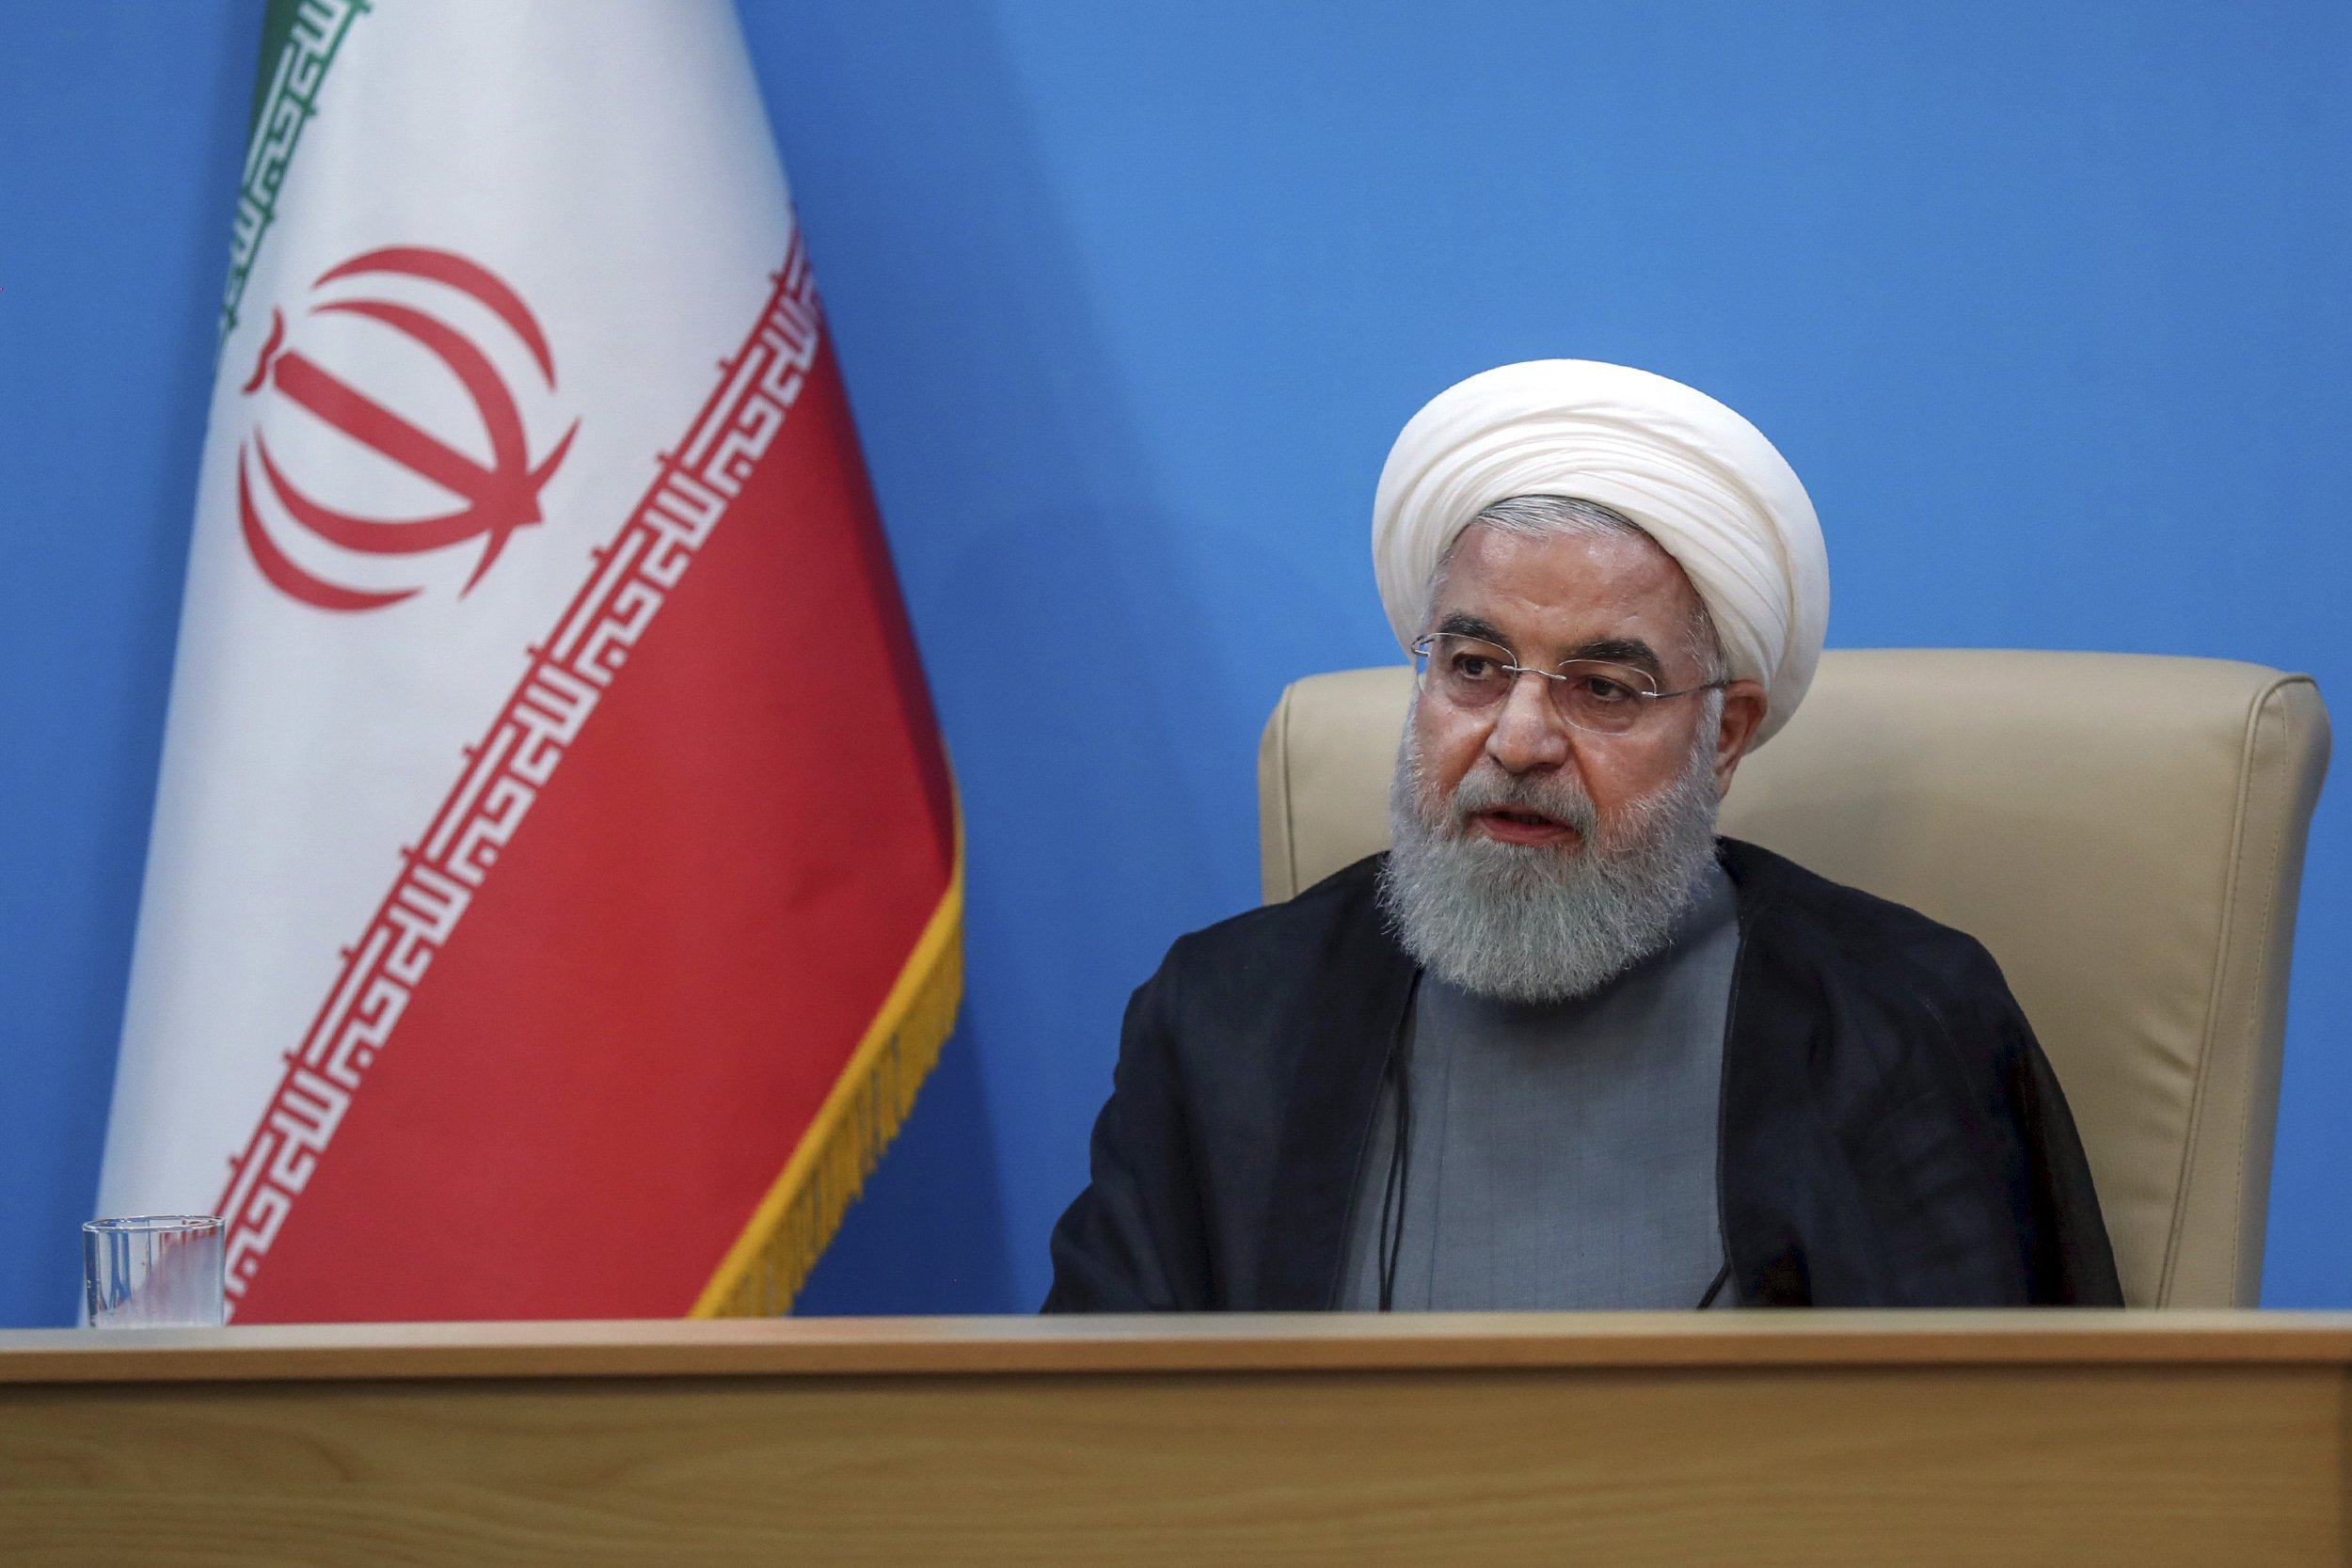 Iran says 'idiotic' new US sanctions shut doors of diplomacy